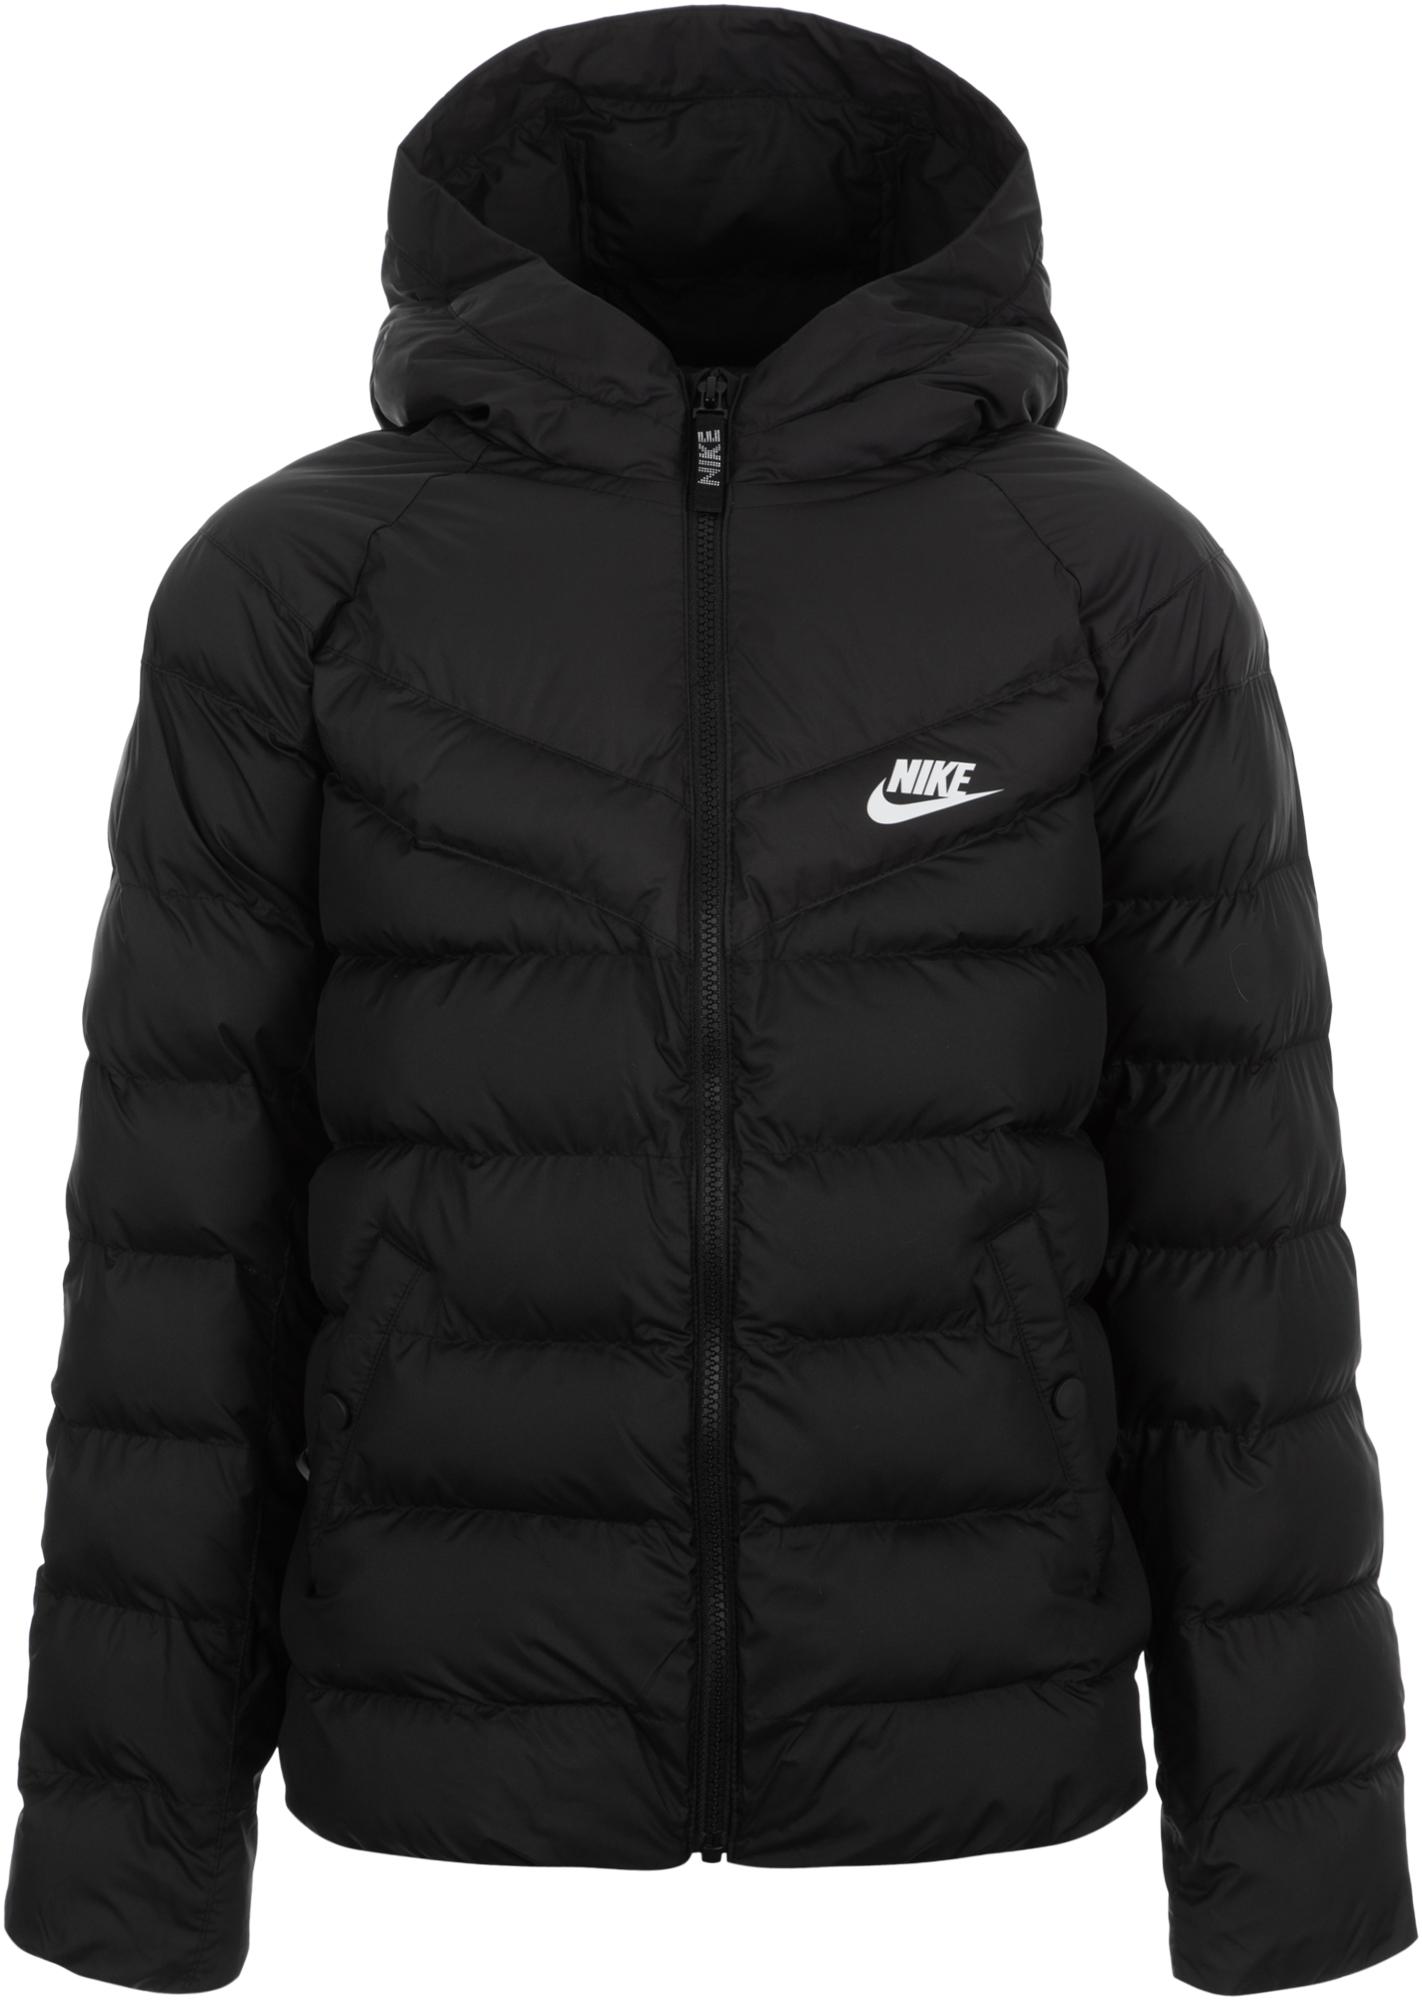 Nike Куртка утепленная для мальчиков Nike, размер 158-170 цена и фото